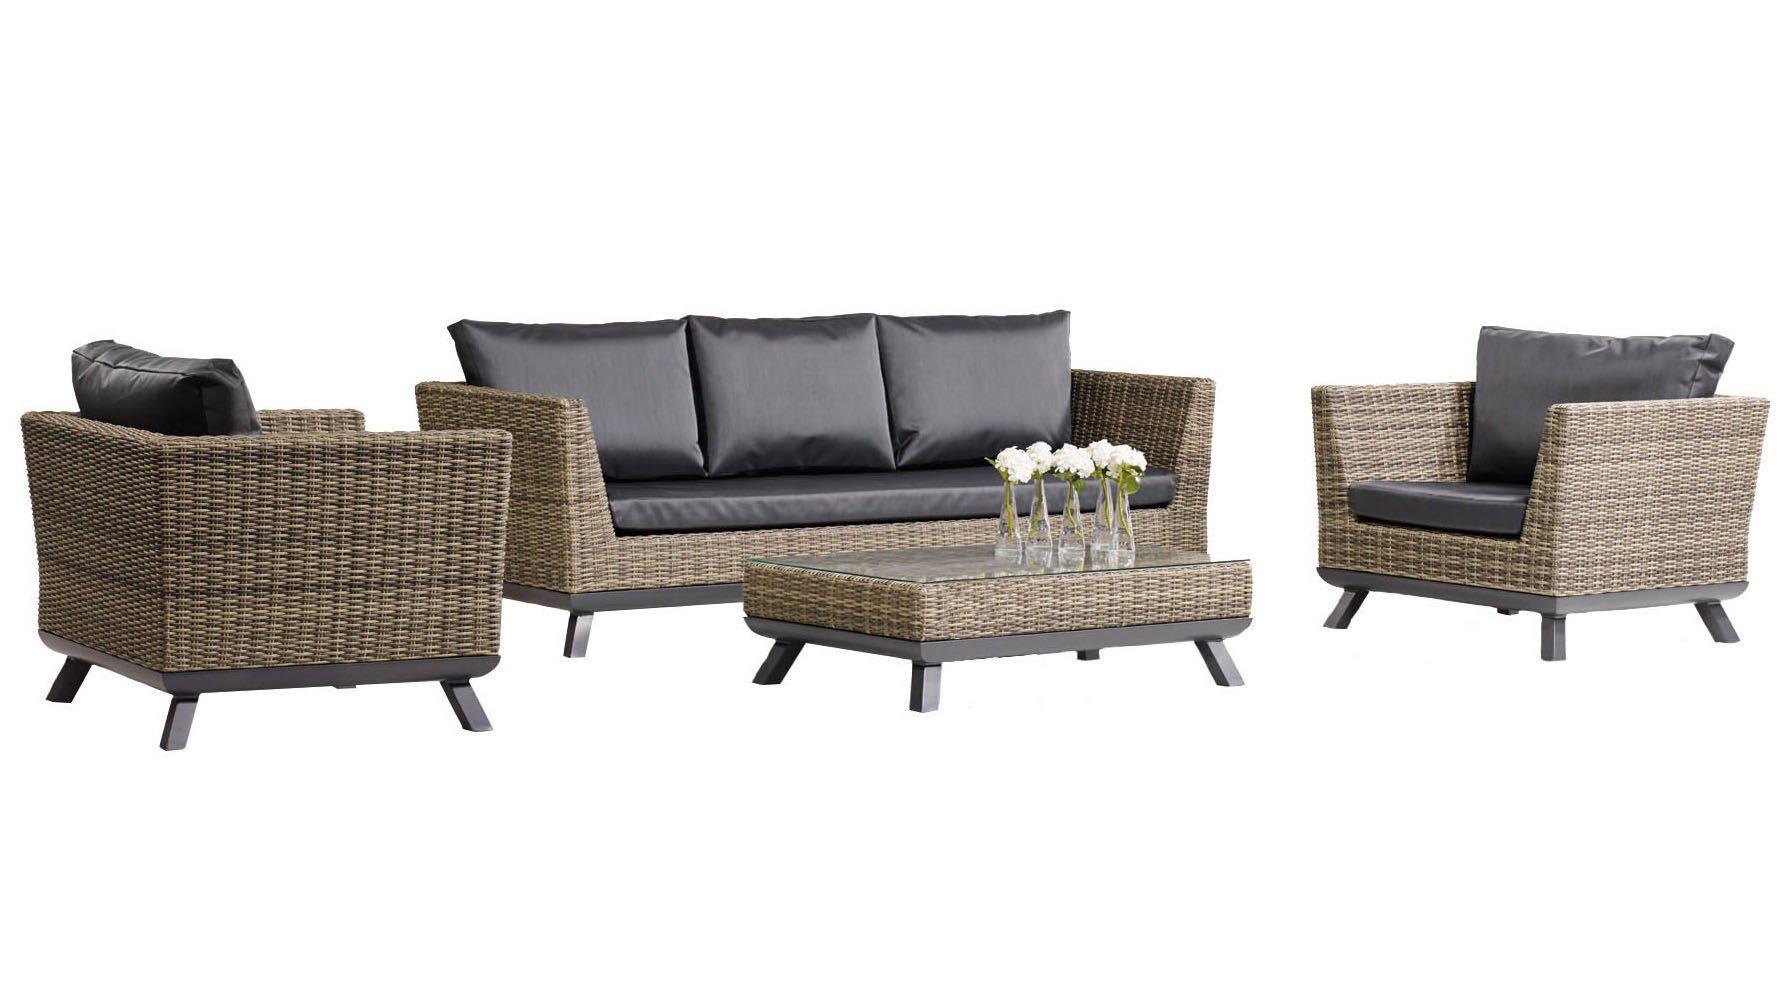 Greywash Rattan Pandora Outdoor Lounge Set with Black ...